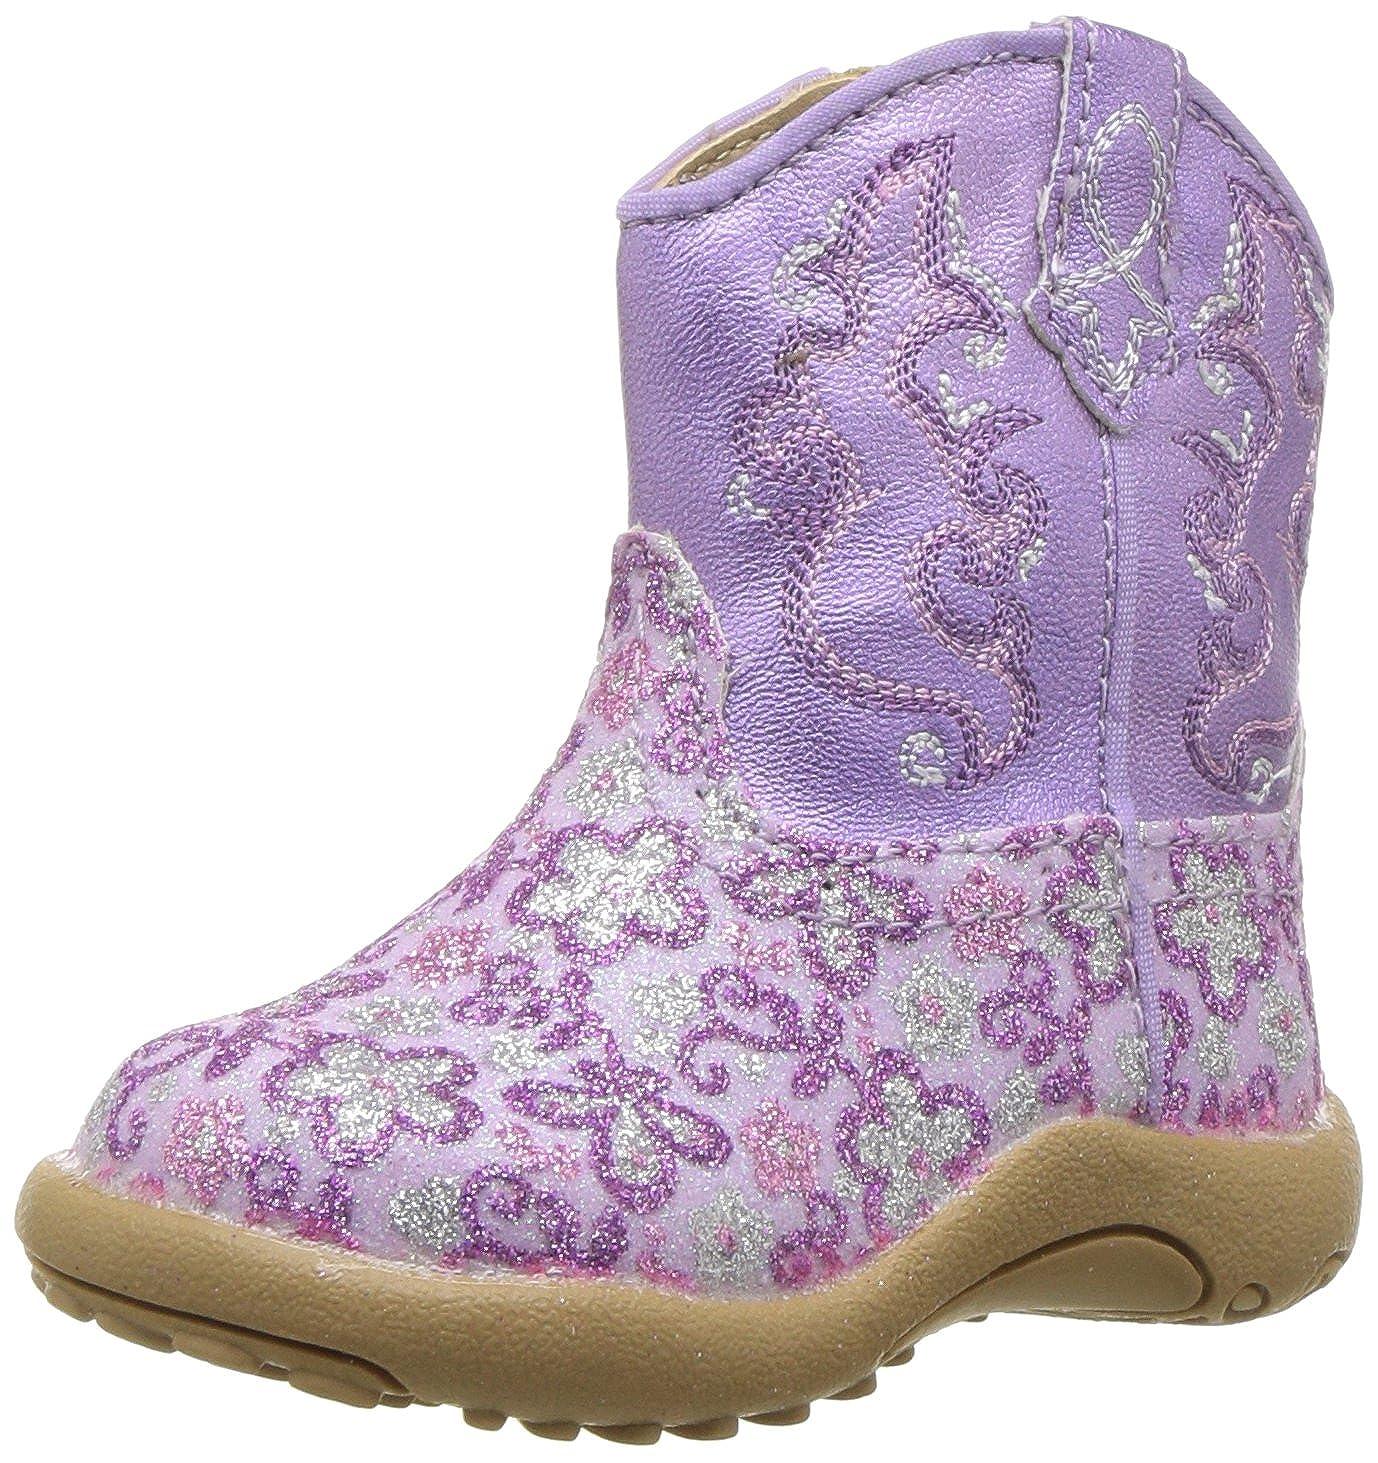 Roper Girls' Cowbaby Lavender, Purple, 1 M US Infant